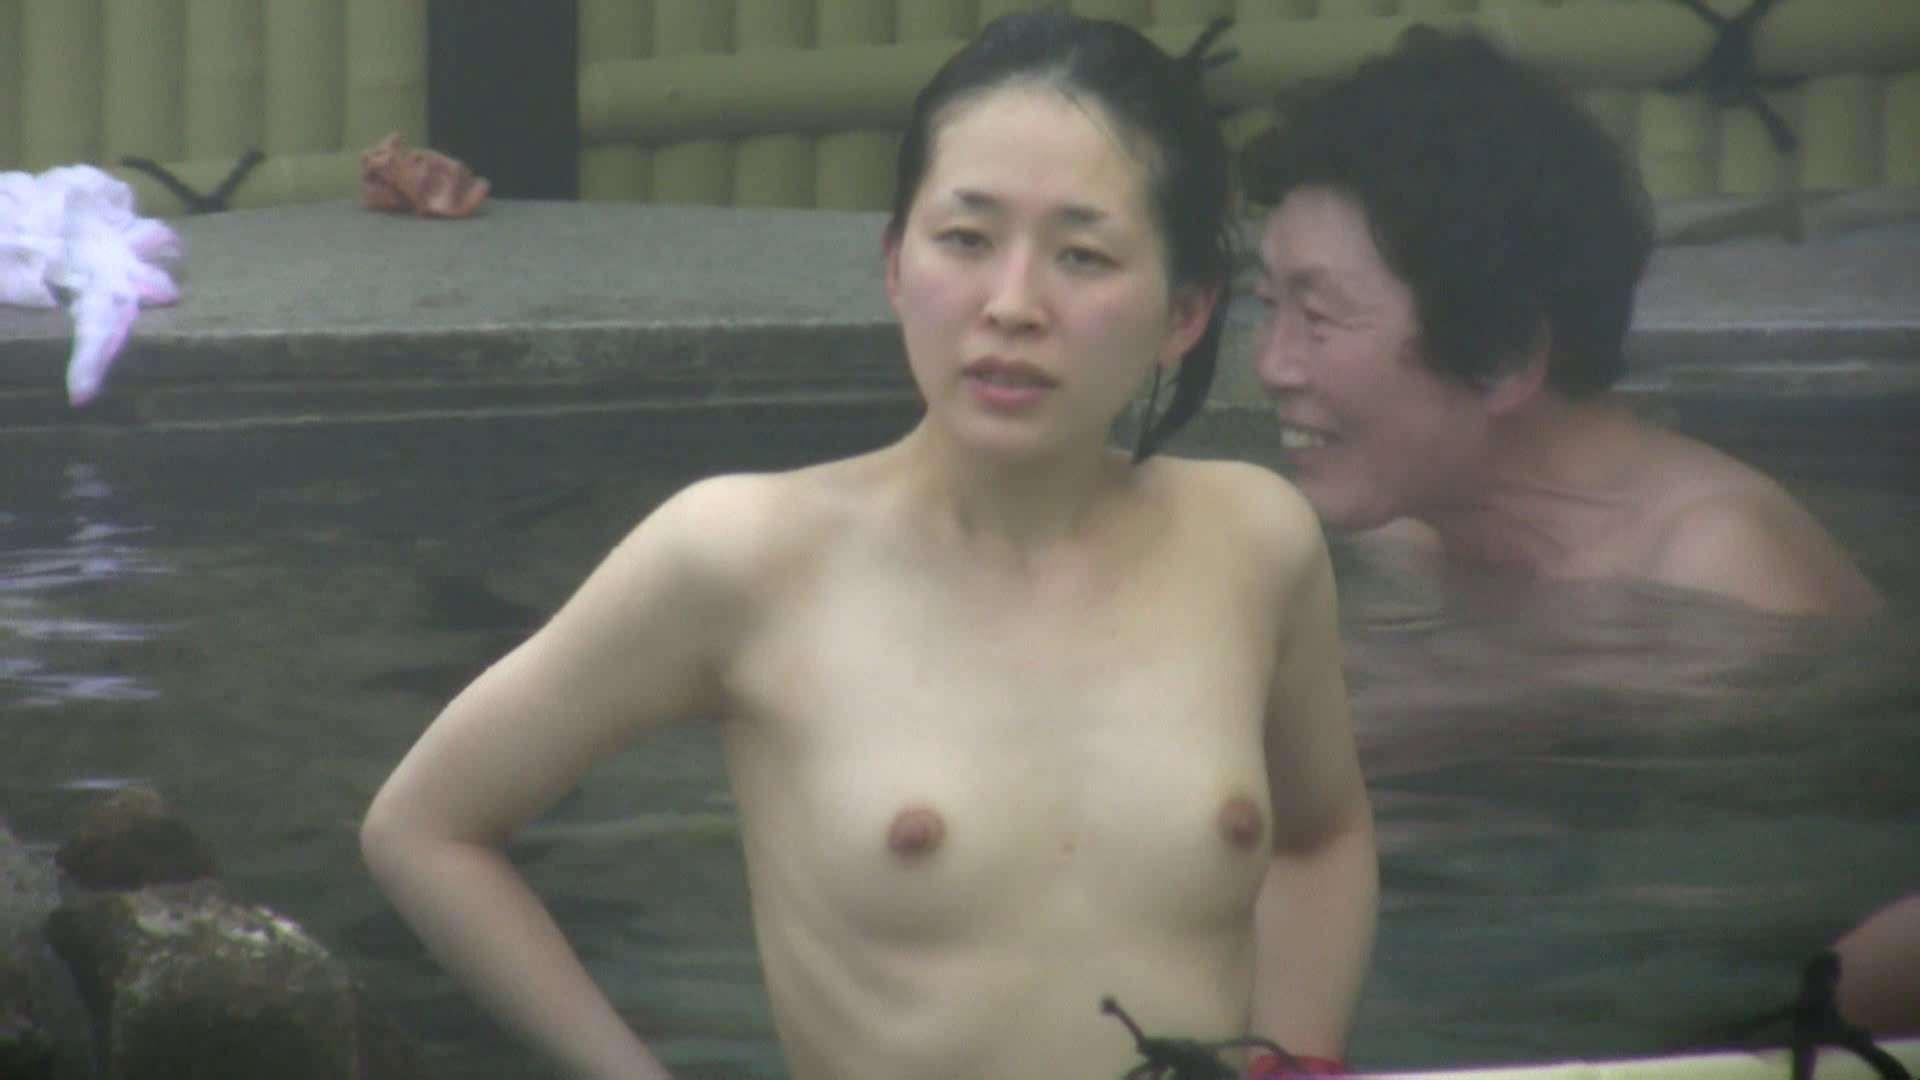 Aquaな露天風呂Vol.583 盗撮 戯れ無修正画像 106枚 41